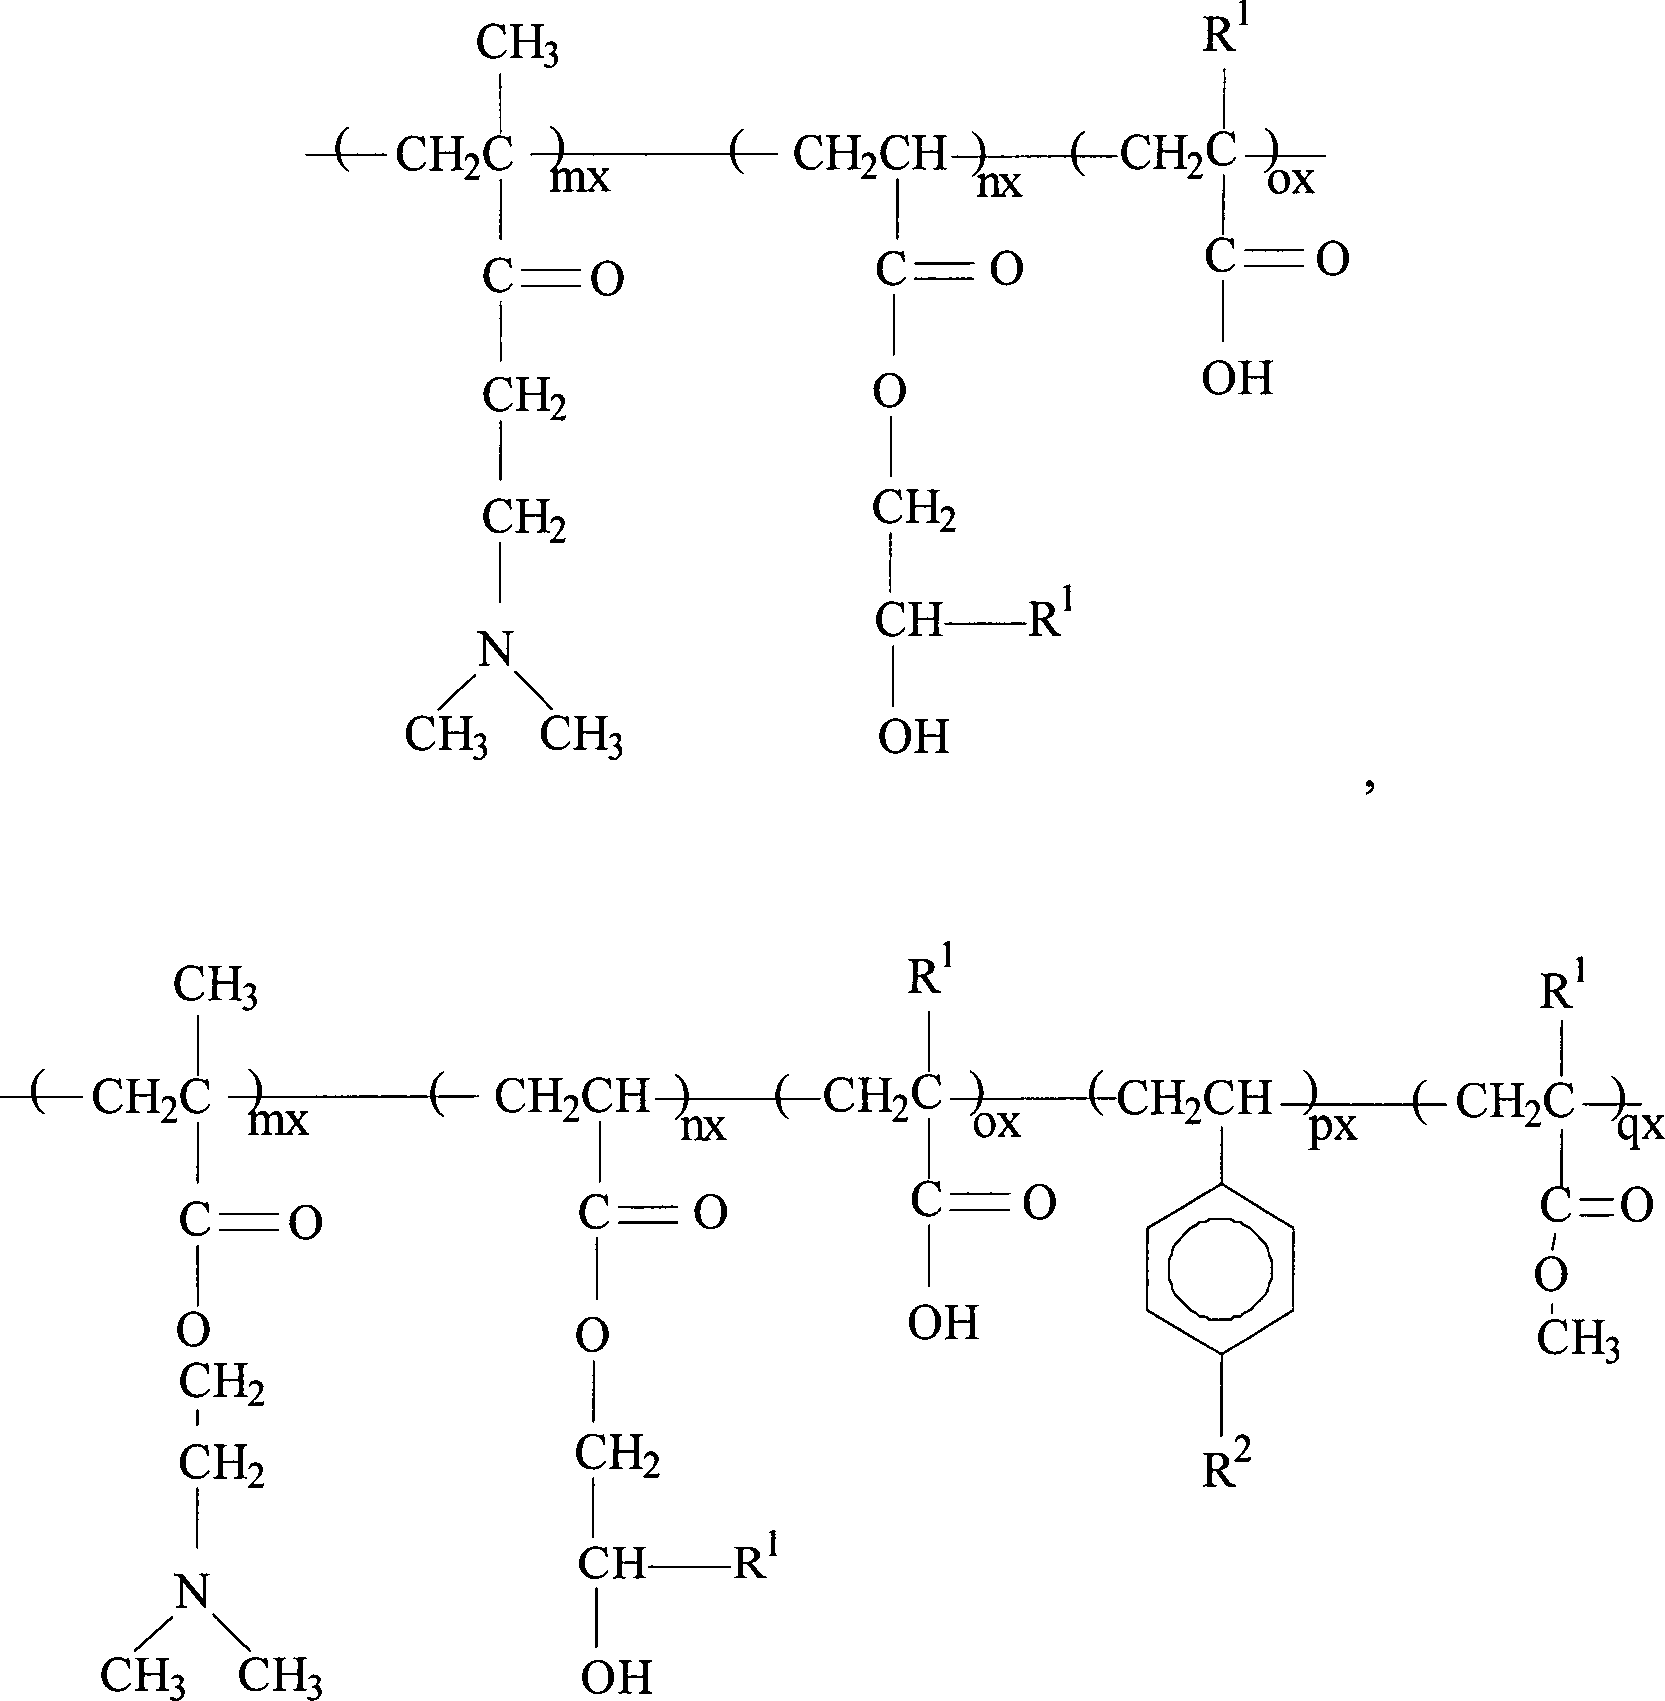 DE60036544T2 - Liquid detergent compositions containing block ...